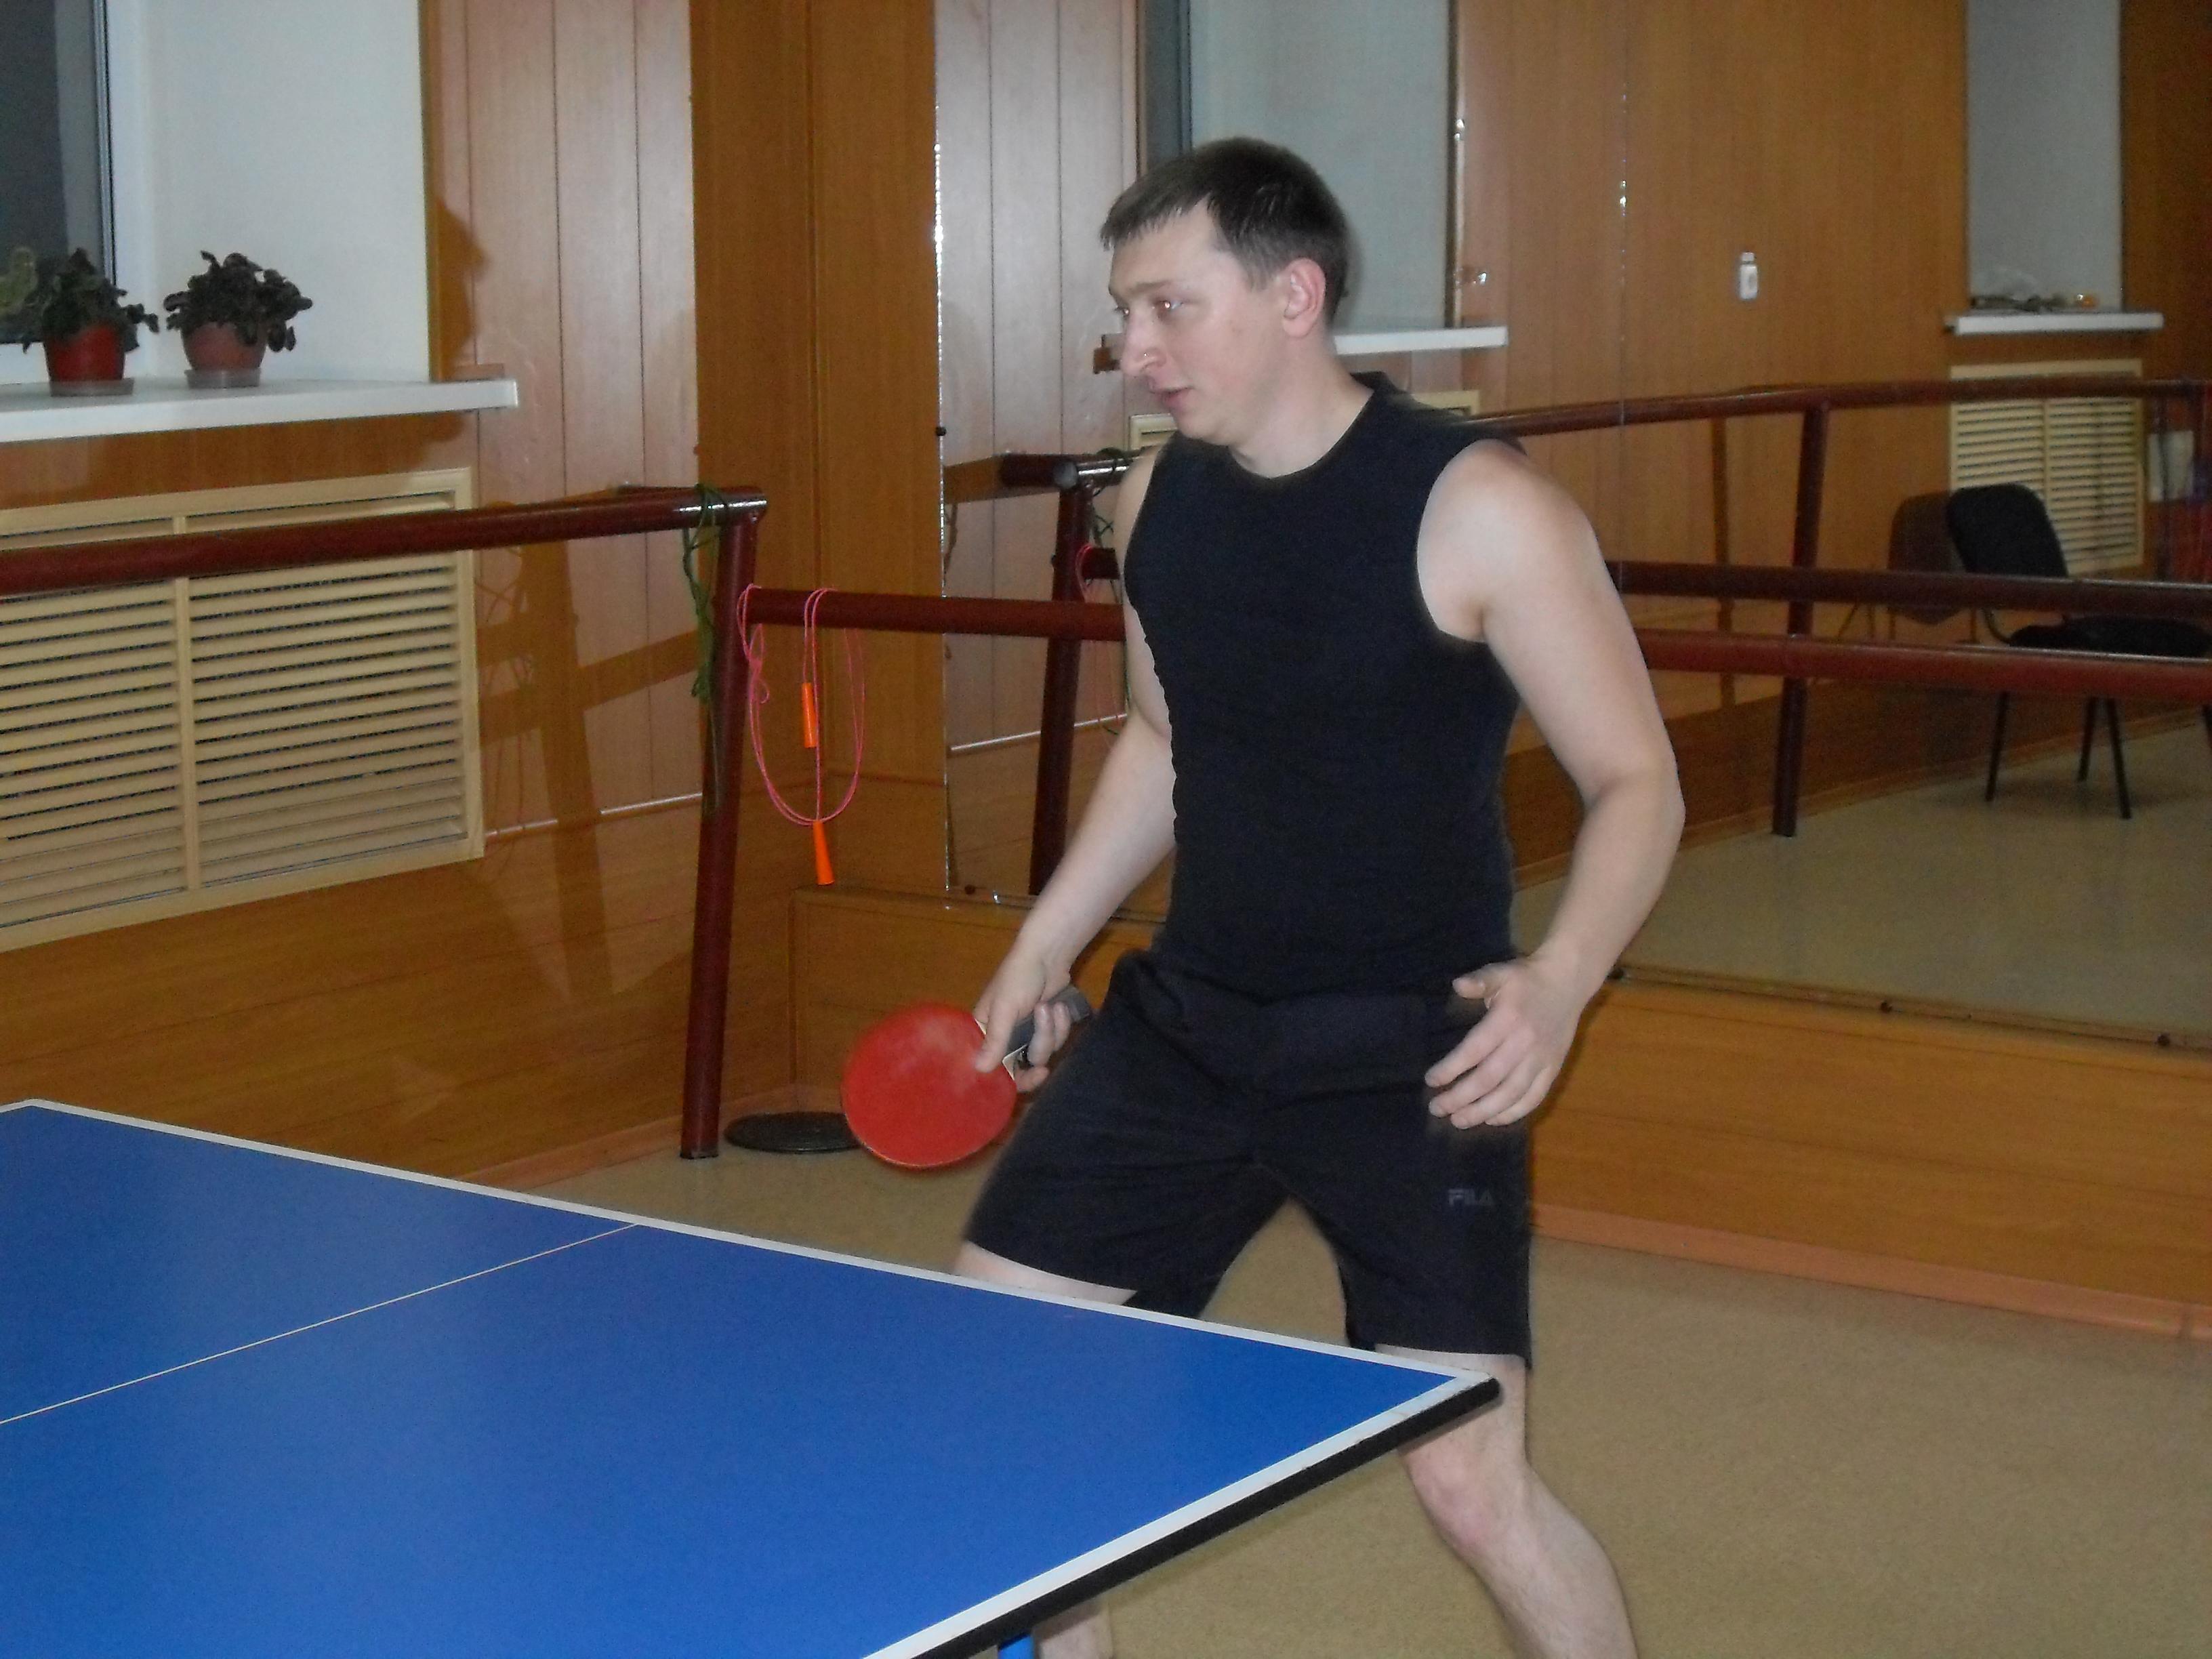 Итоги теннисного турнира среди ППС ЮТИ ТПУ.